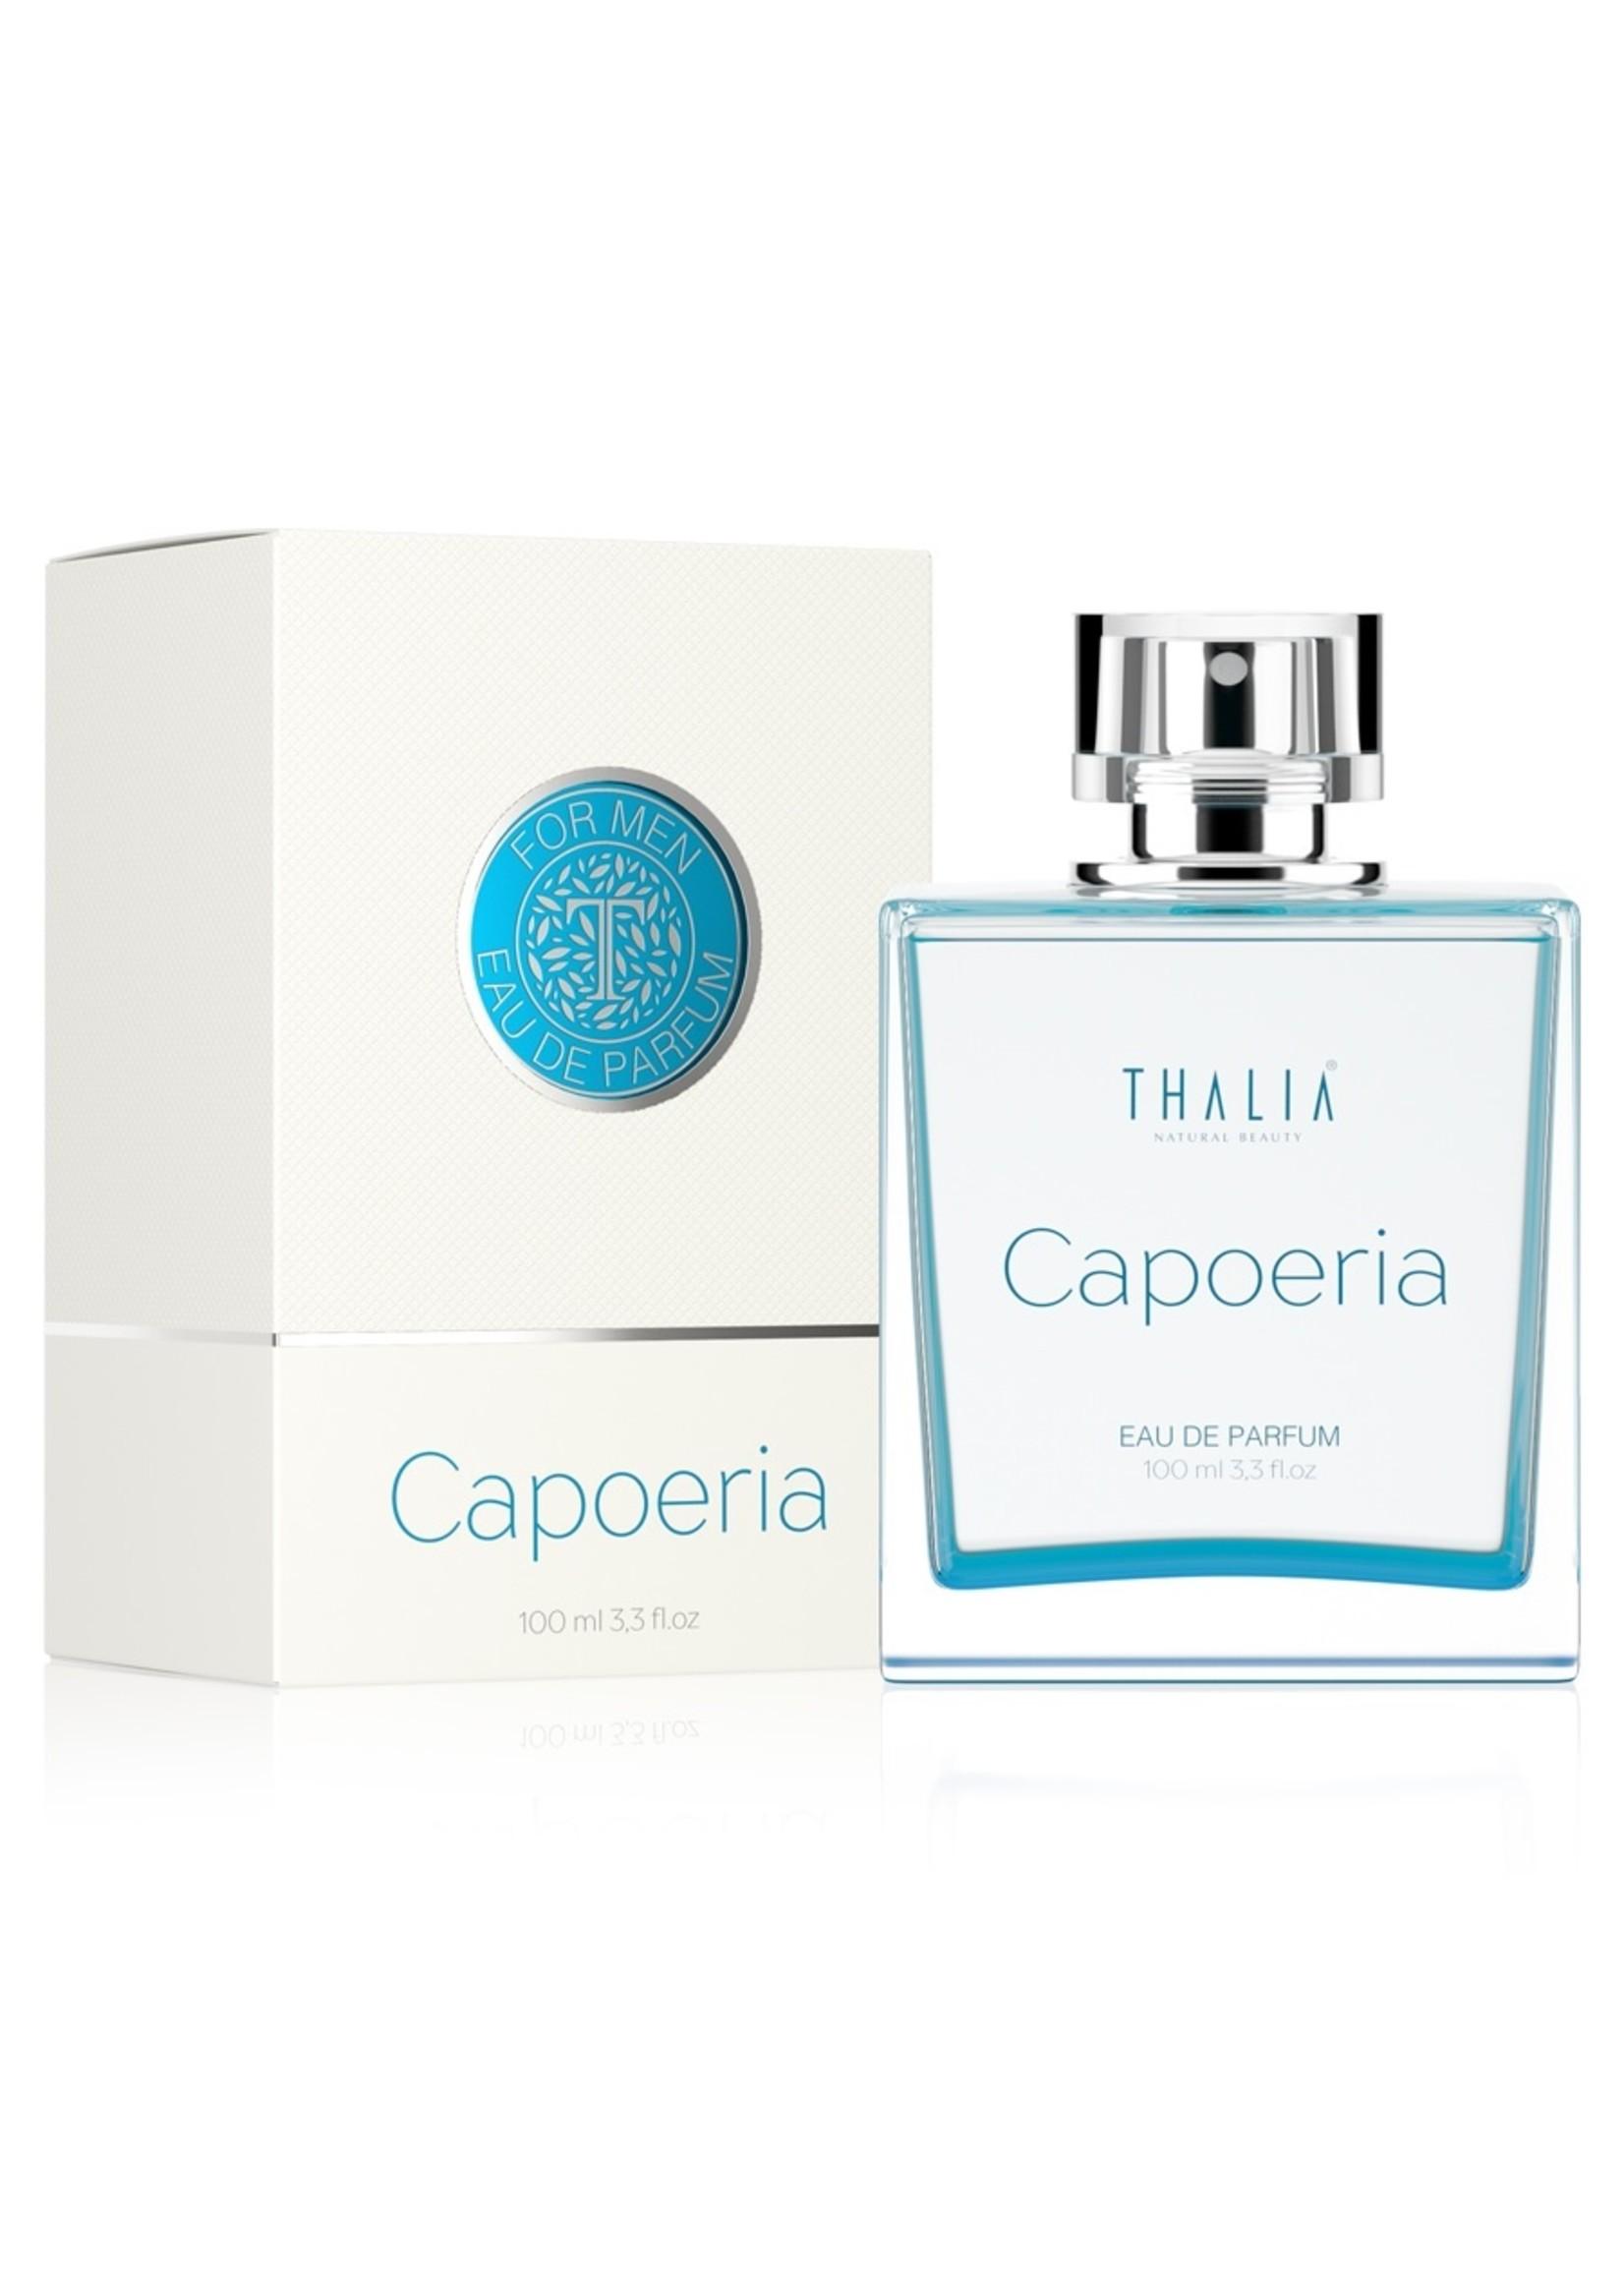 Thalia Capoeria - Eau de Parfum 100 ml